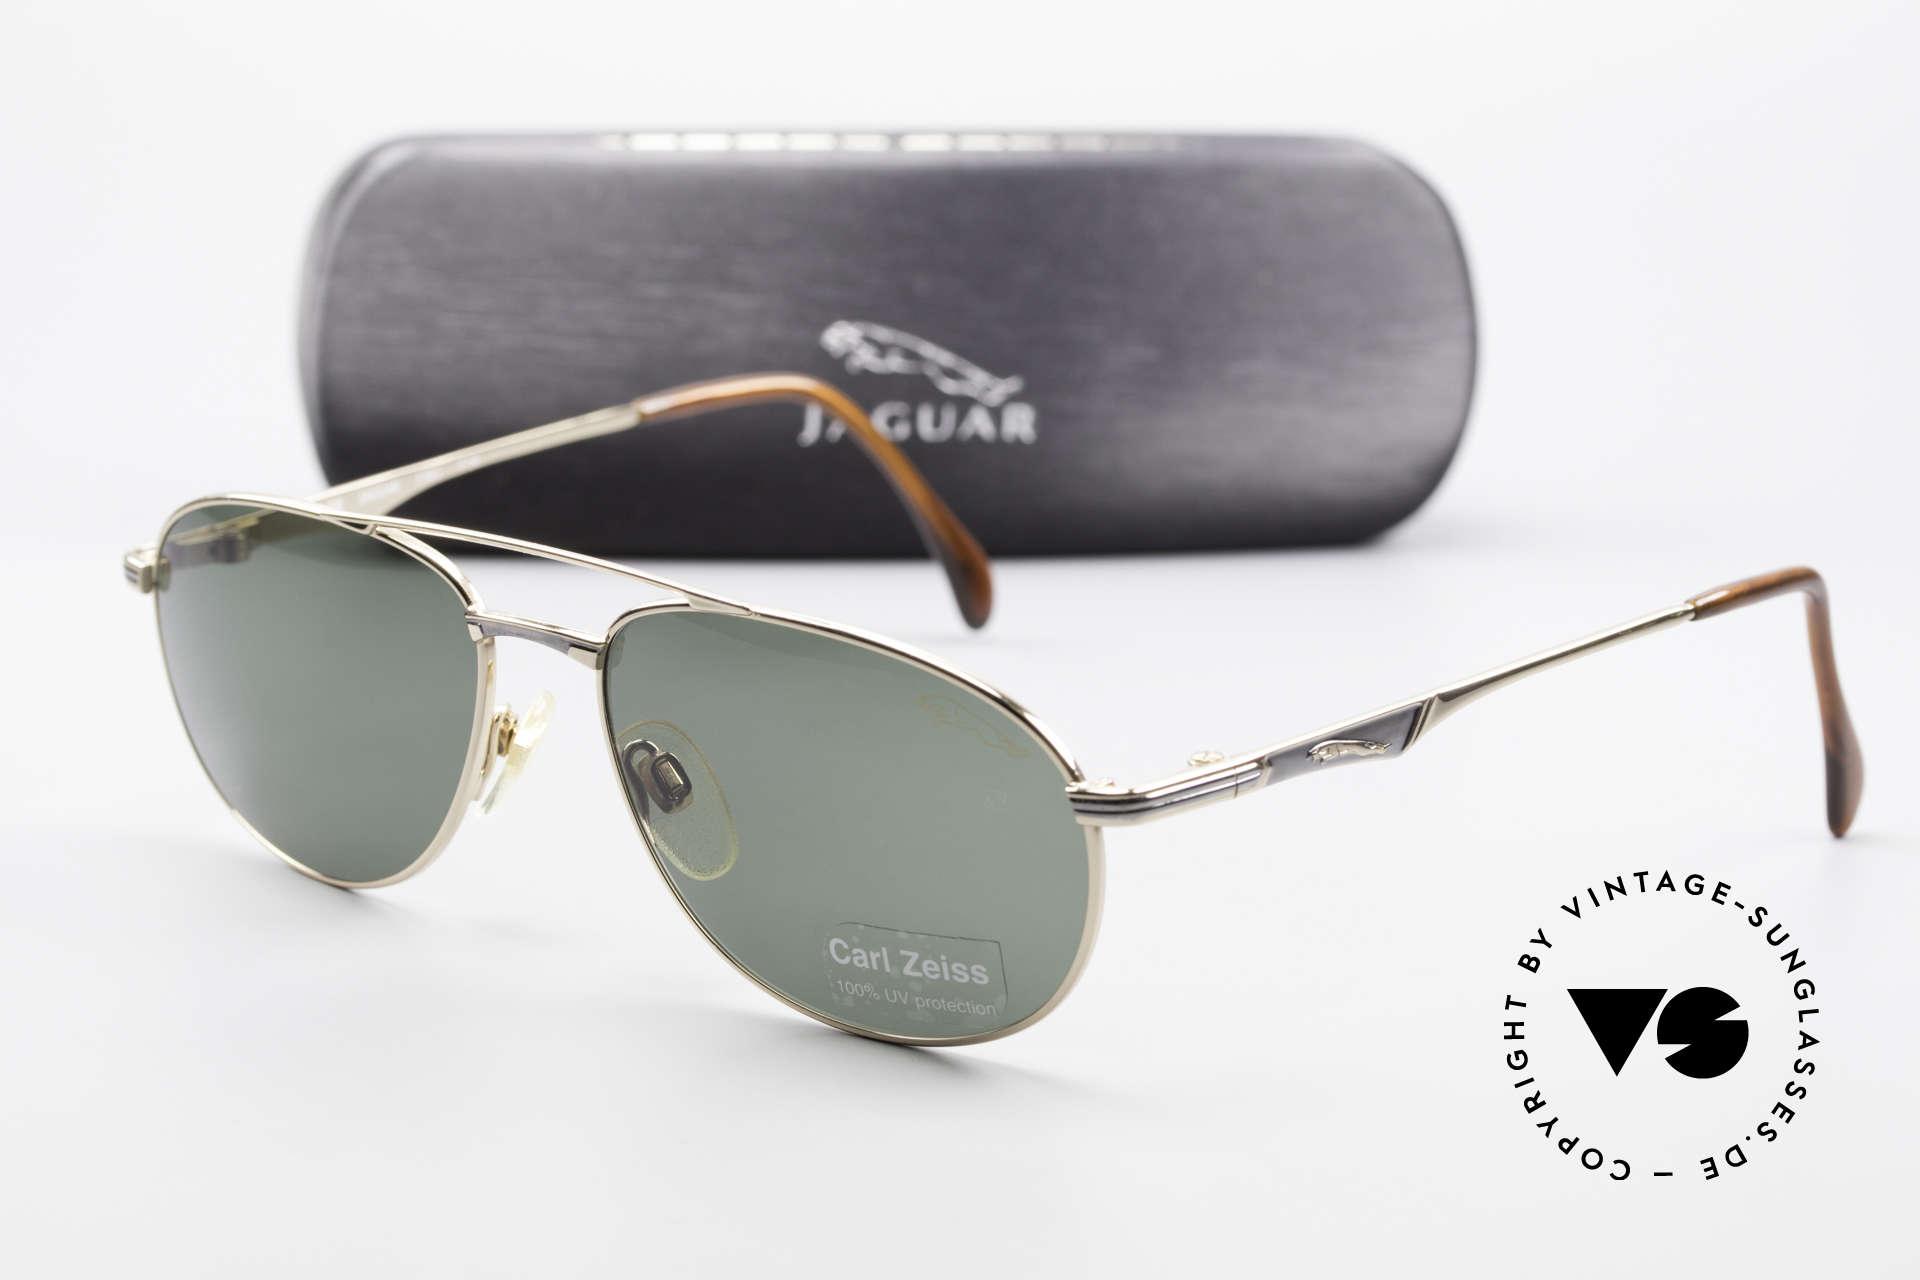 Jaguar 3709 Rare Vintage Sunglasses 90's, Size: large, Made for Men